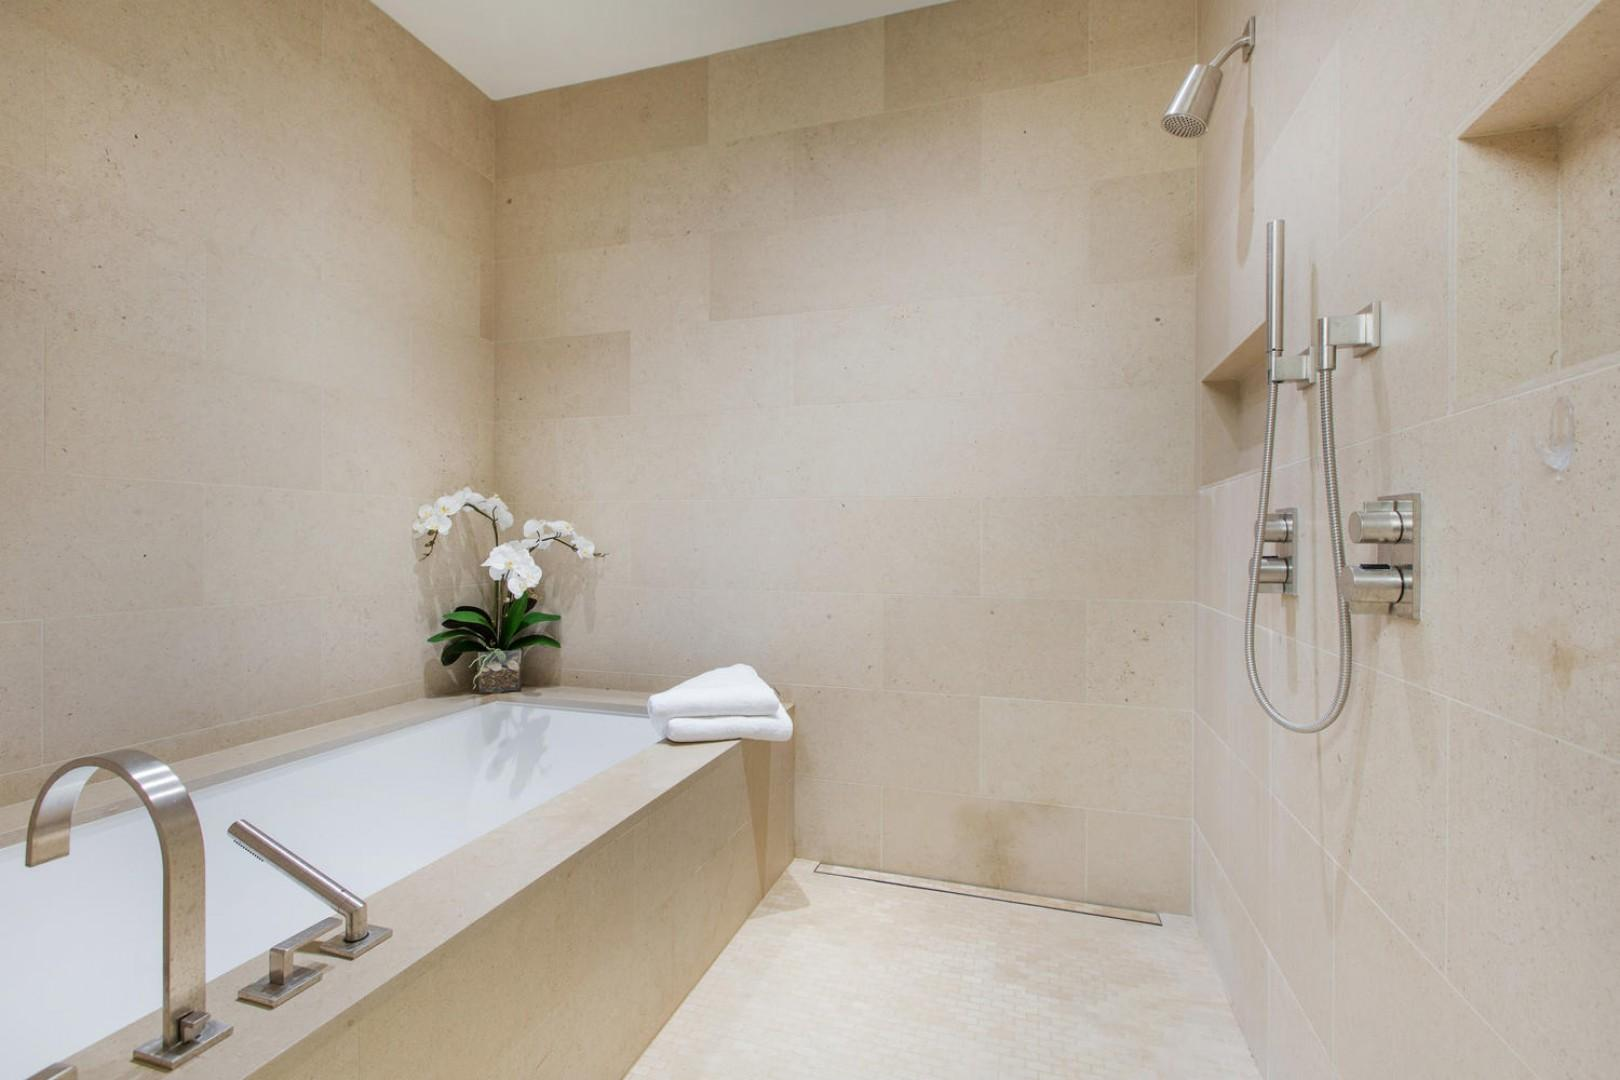 Master Bathroom Tub/Shower Room